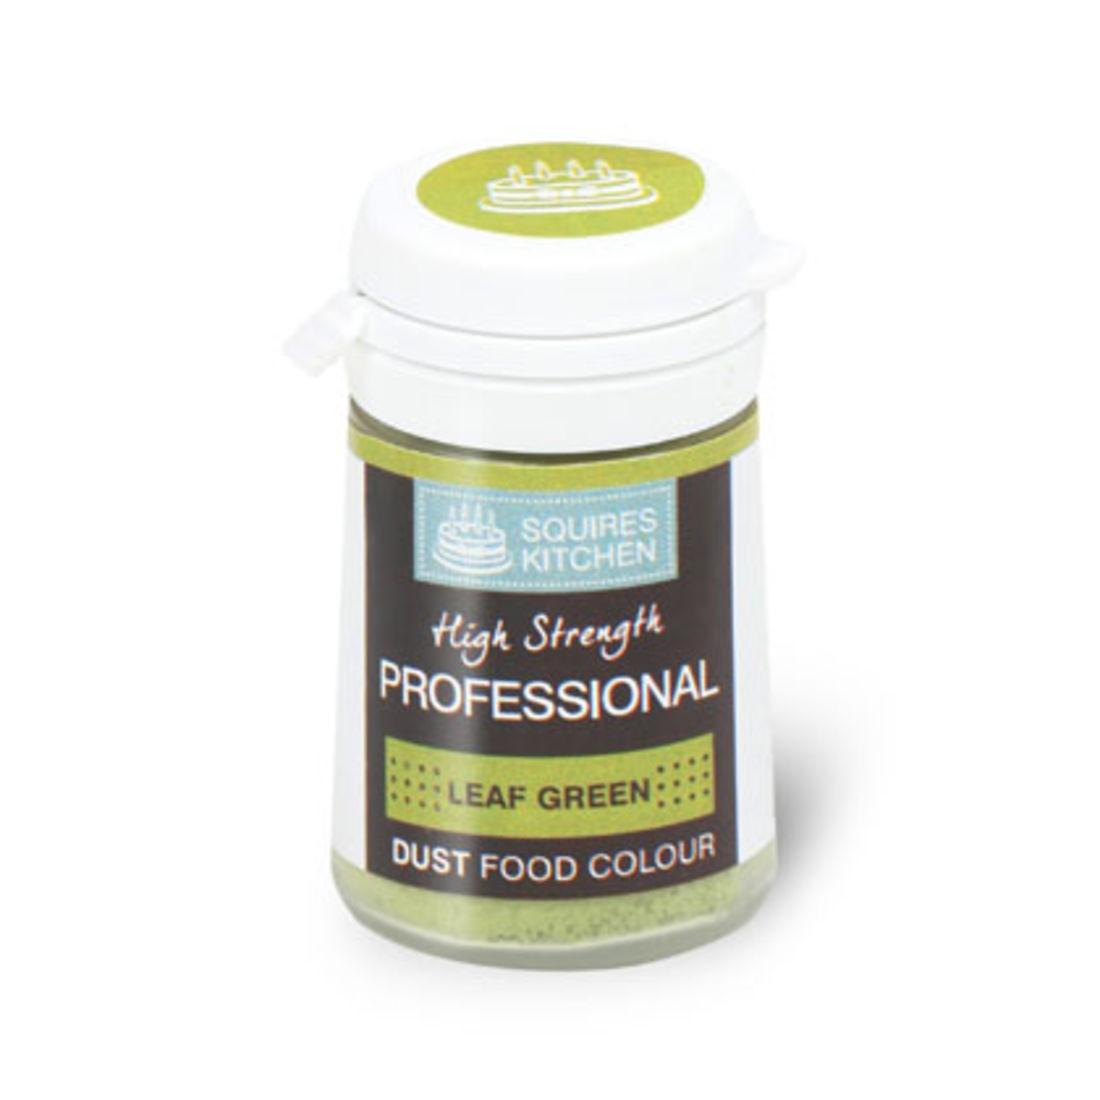 SK Professional Dust Food Colour Leaf Green